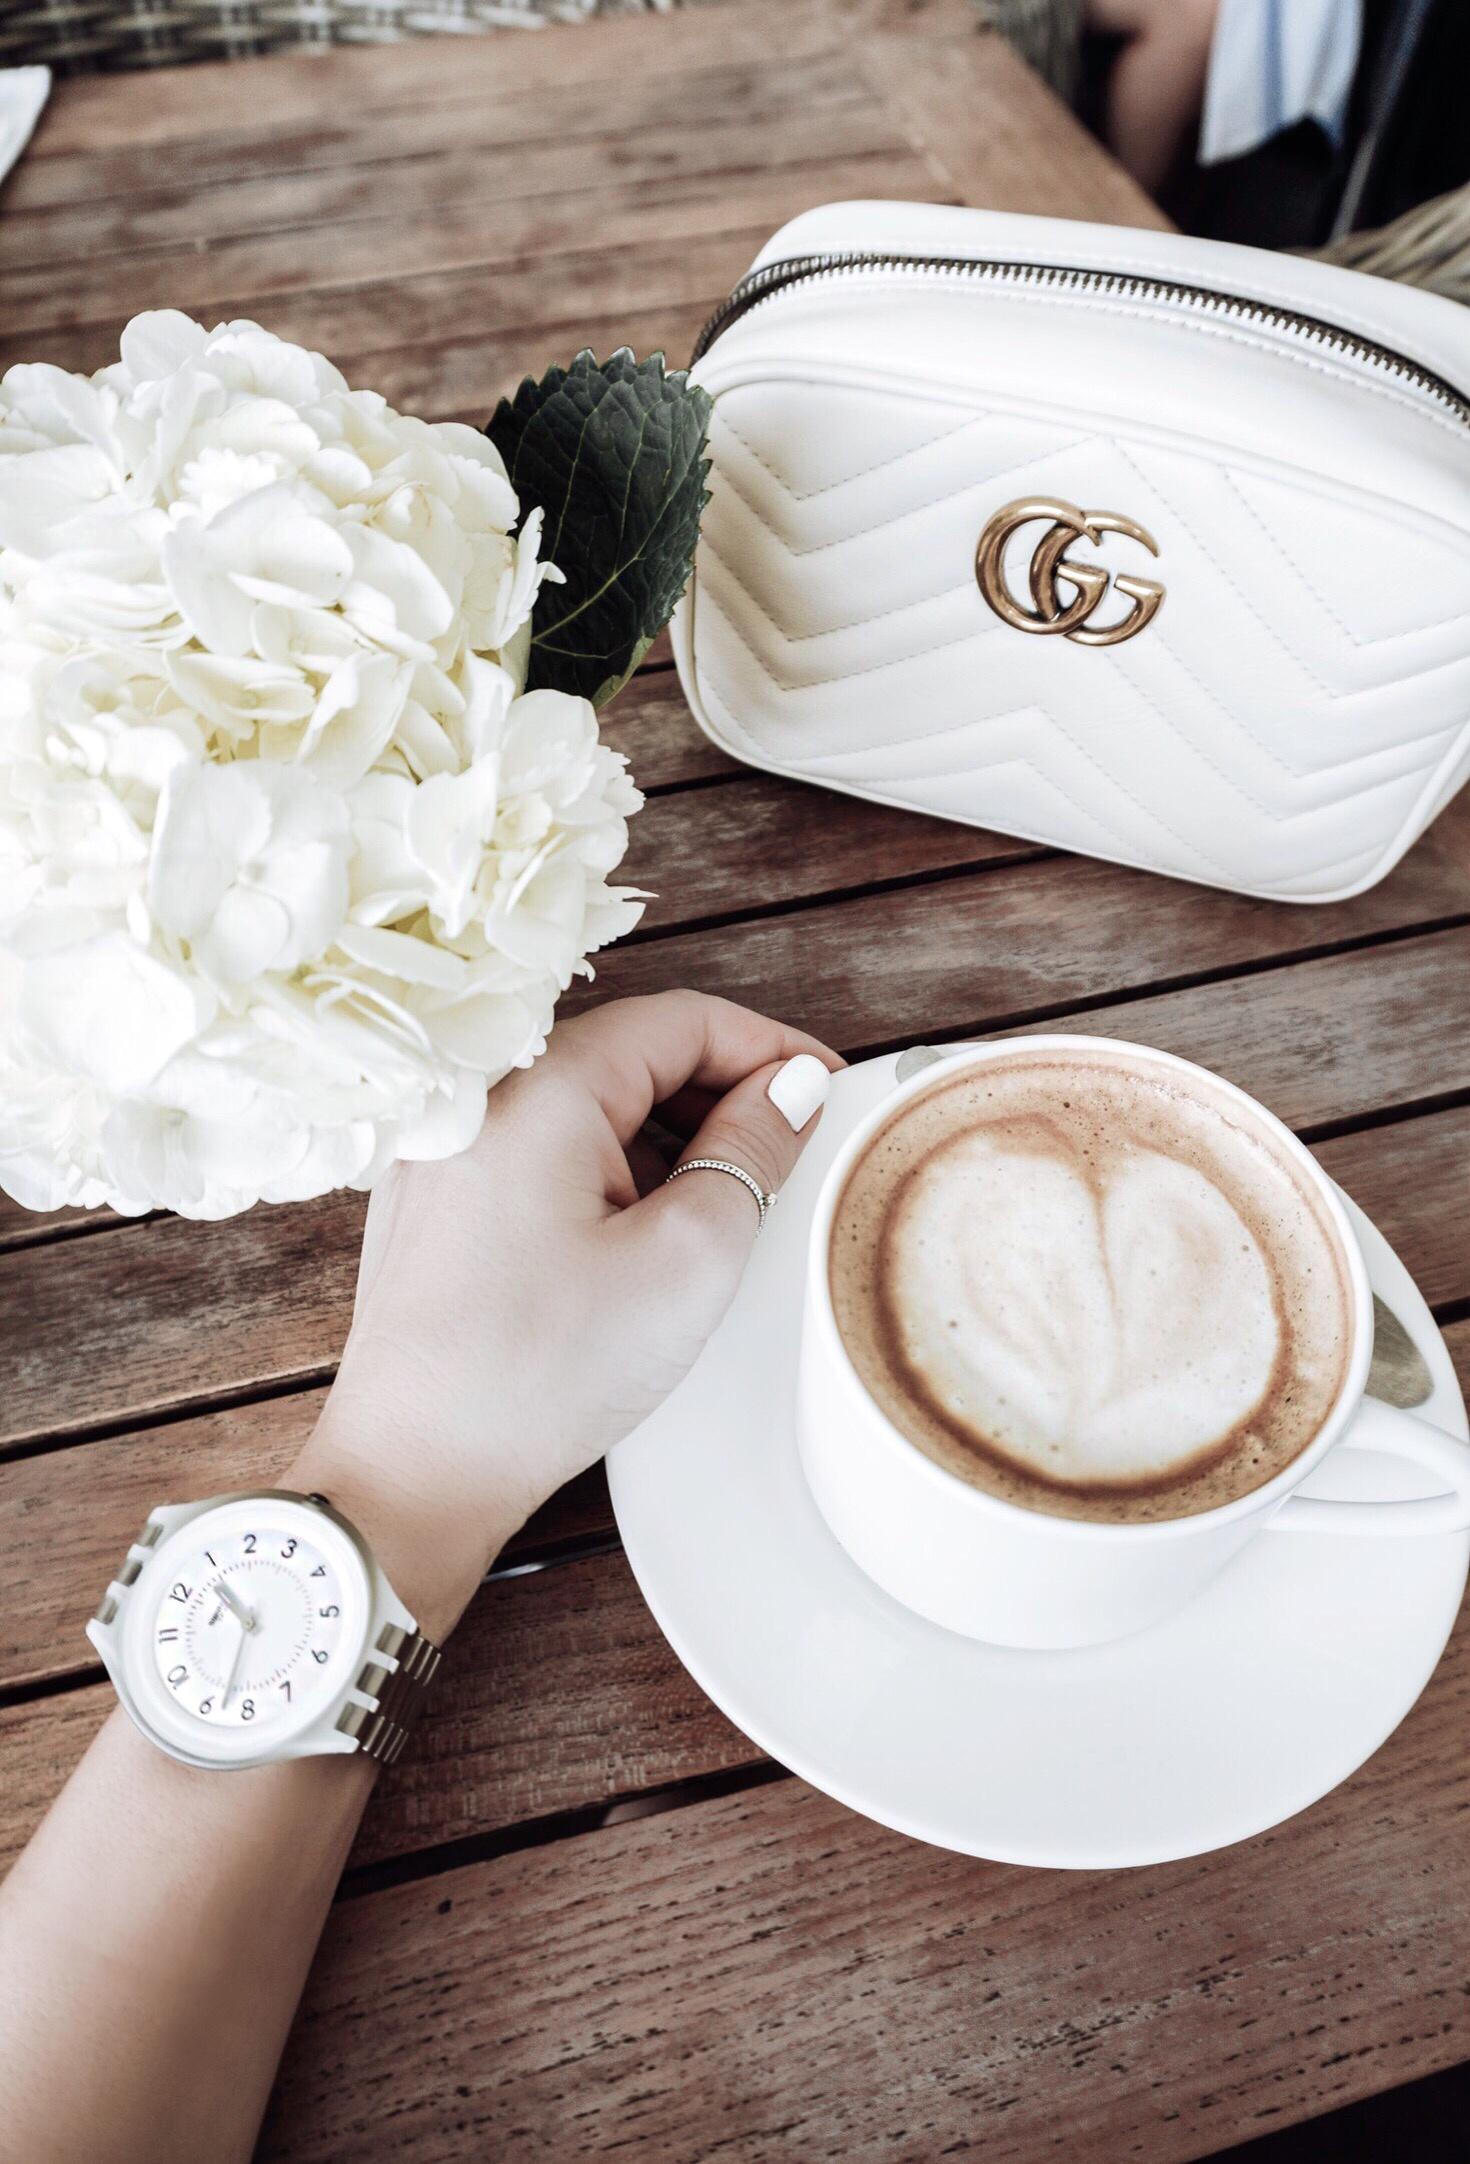 Tiffany Jais Houston fashion and lifestyle blogger of Flaunt and Center   Houston fashion blogger 2017 summer fashion trends   Coffee flatlay, flatlay